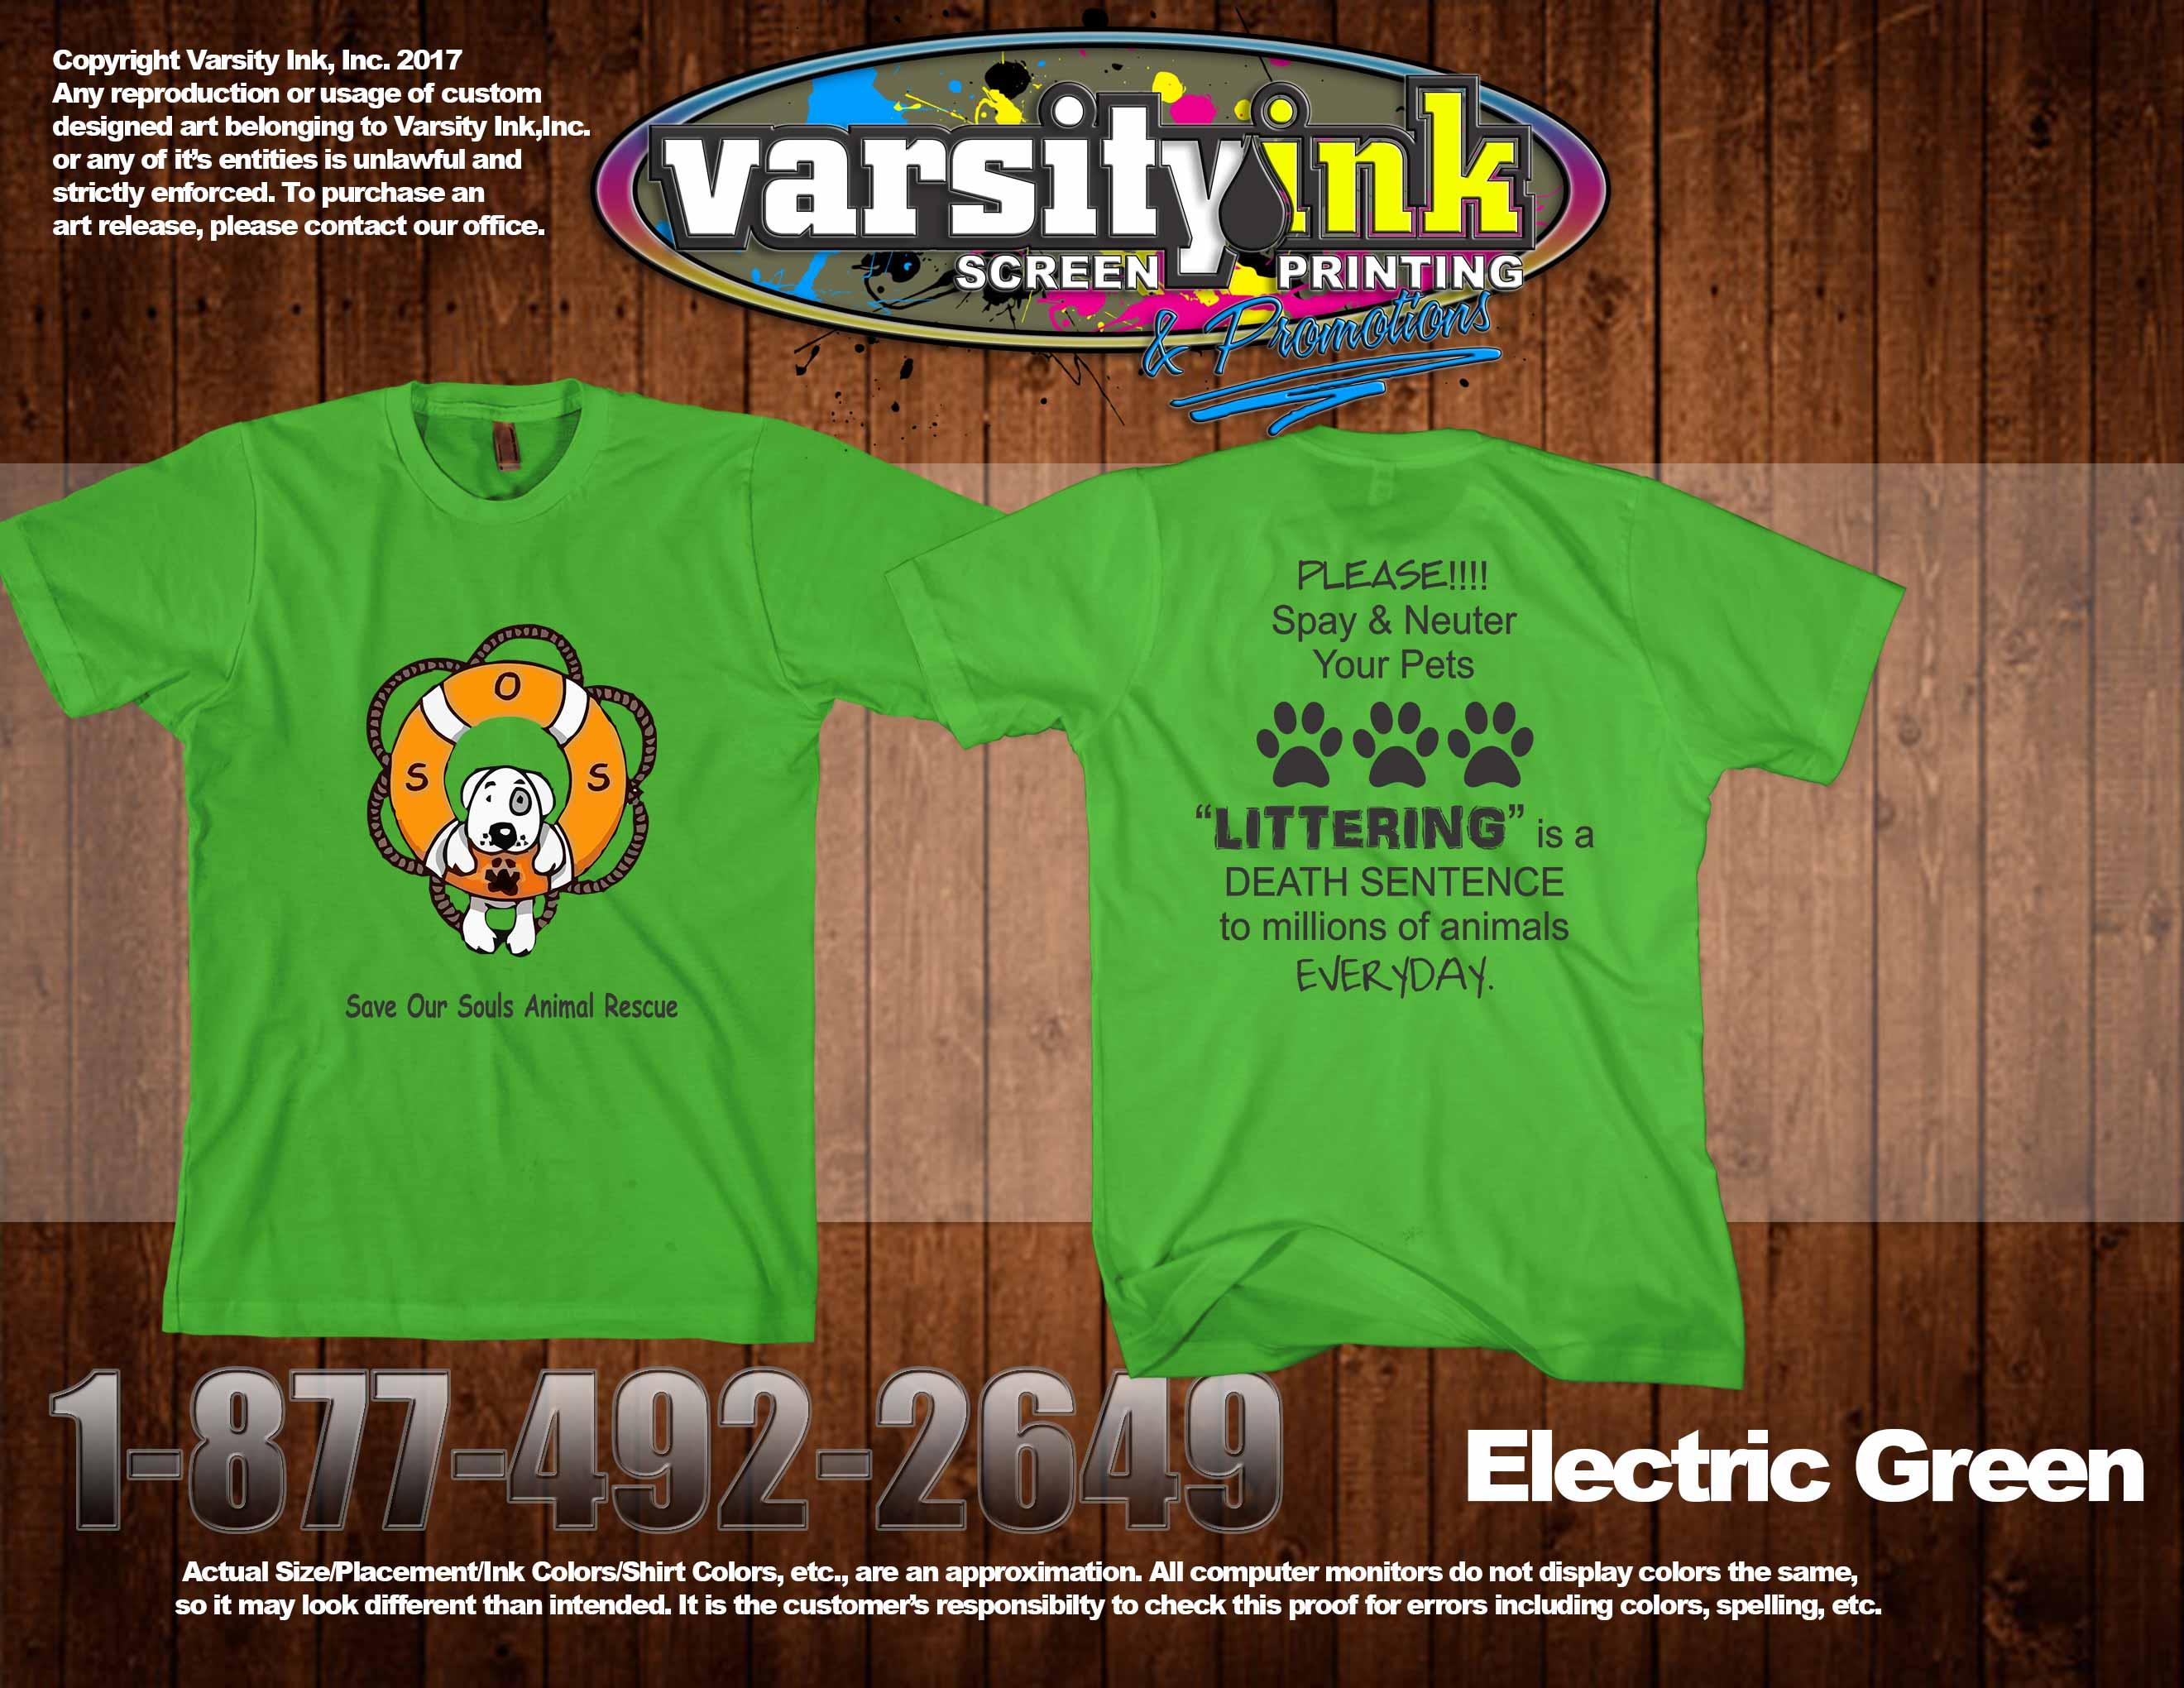 SOS-Electric-Green